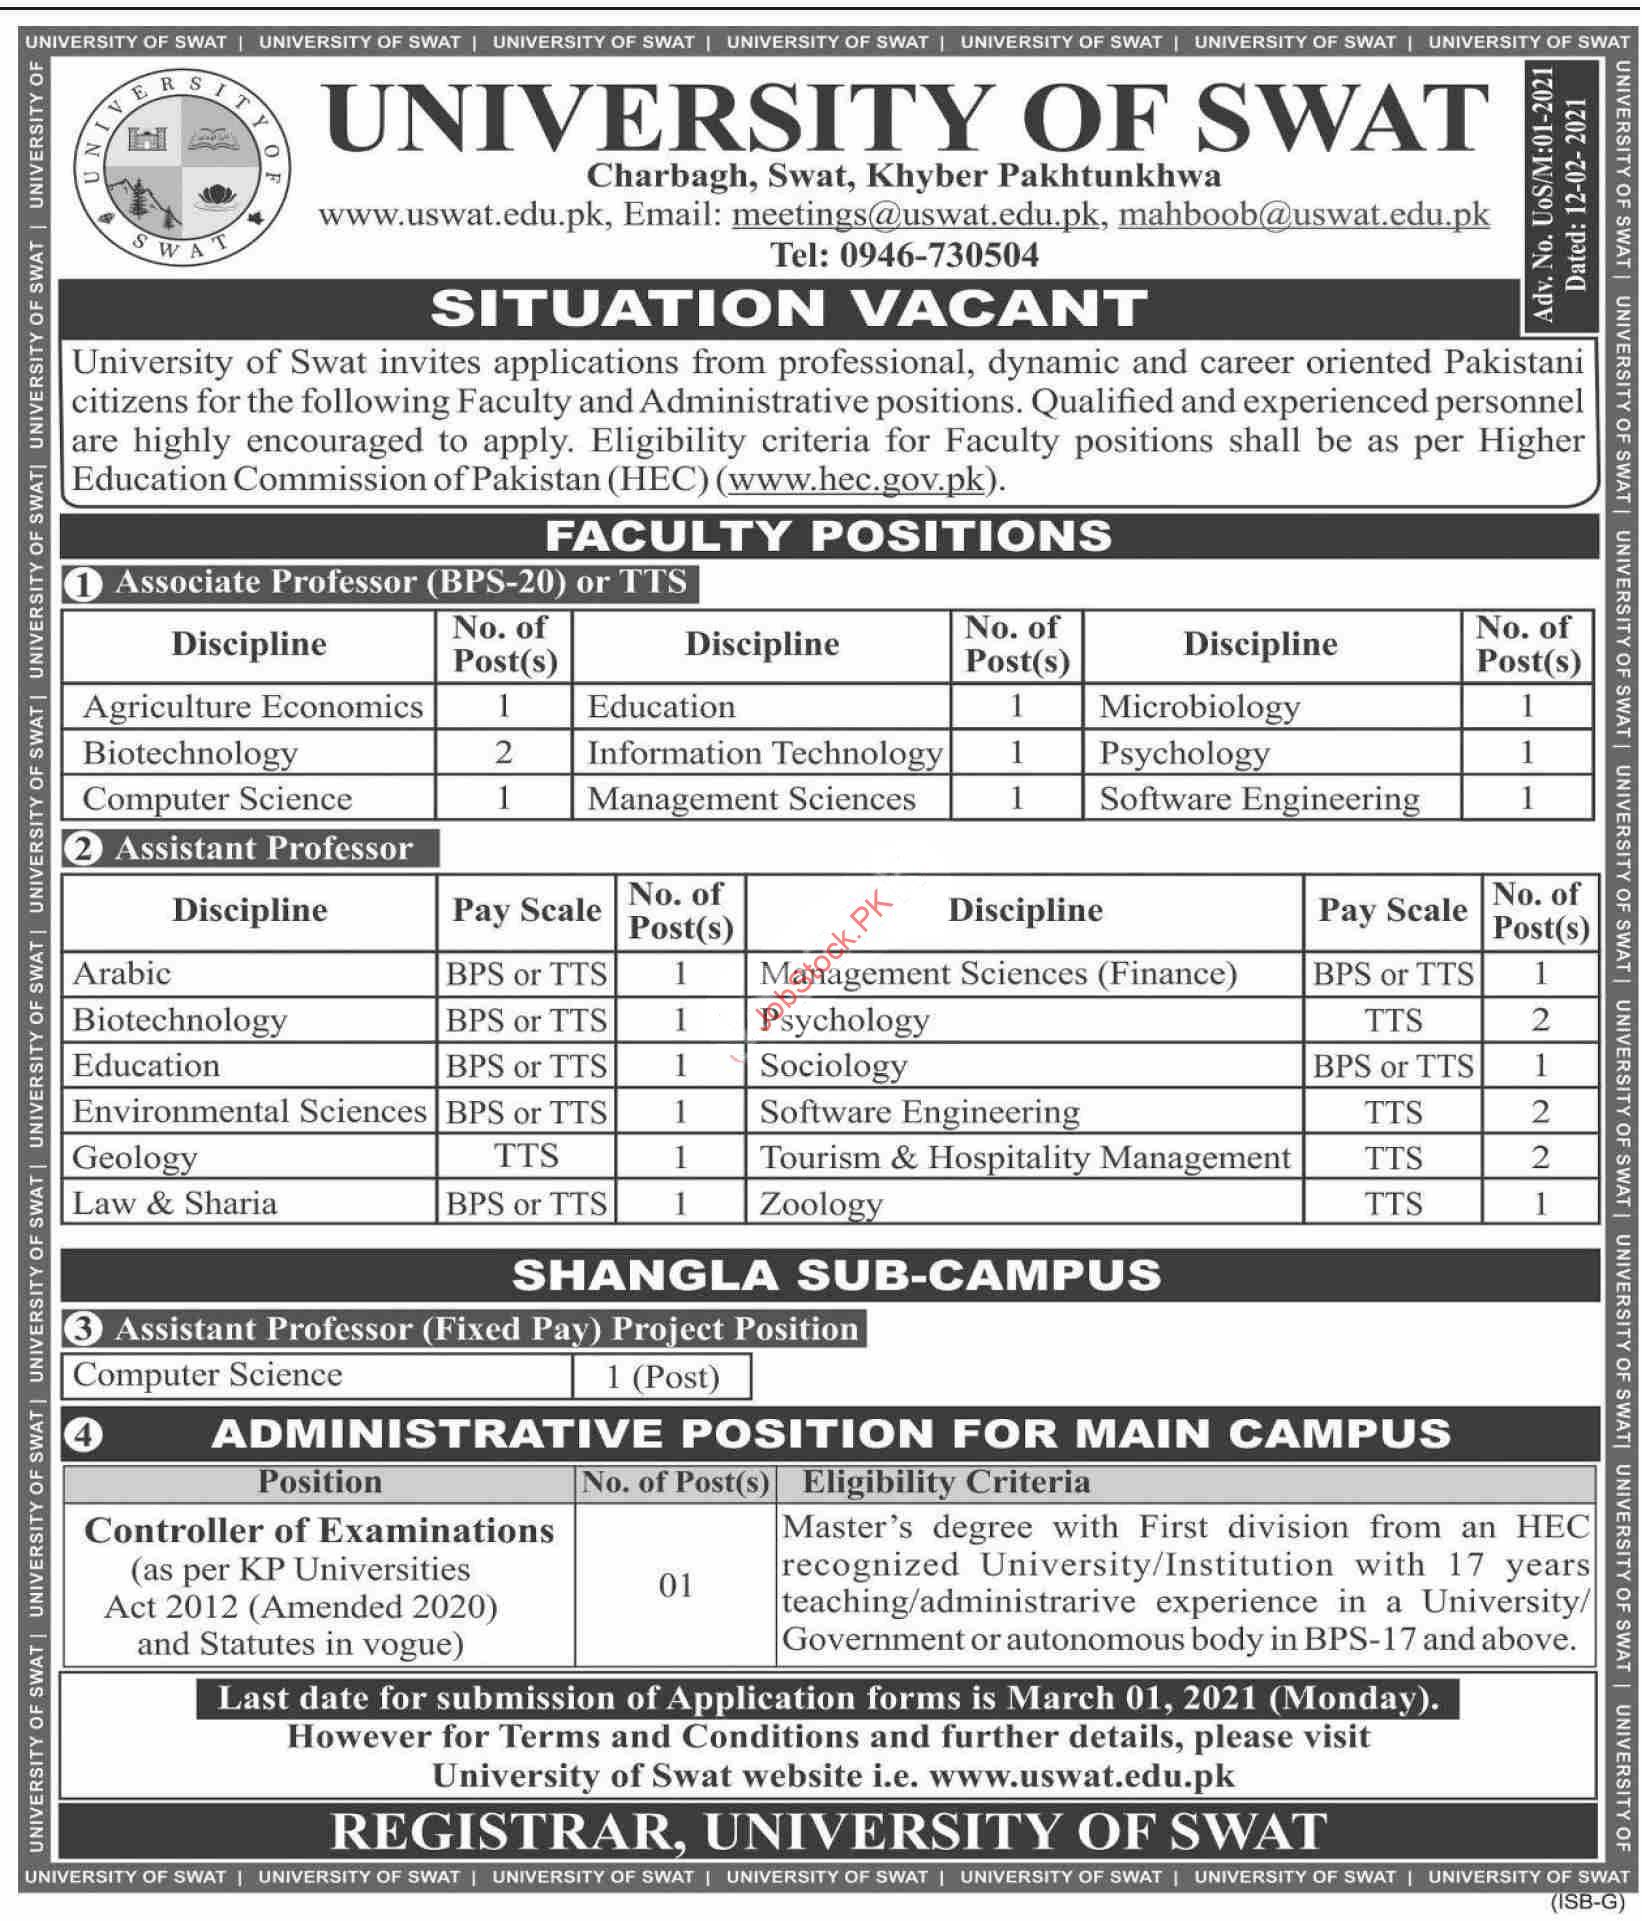 University Of Swat Jobs 2021 Latest